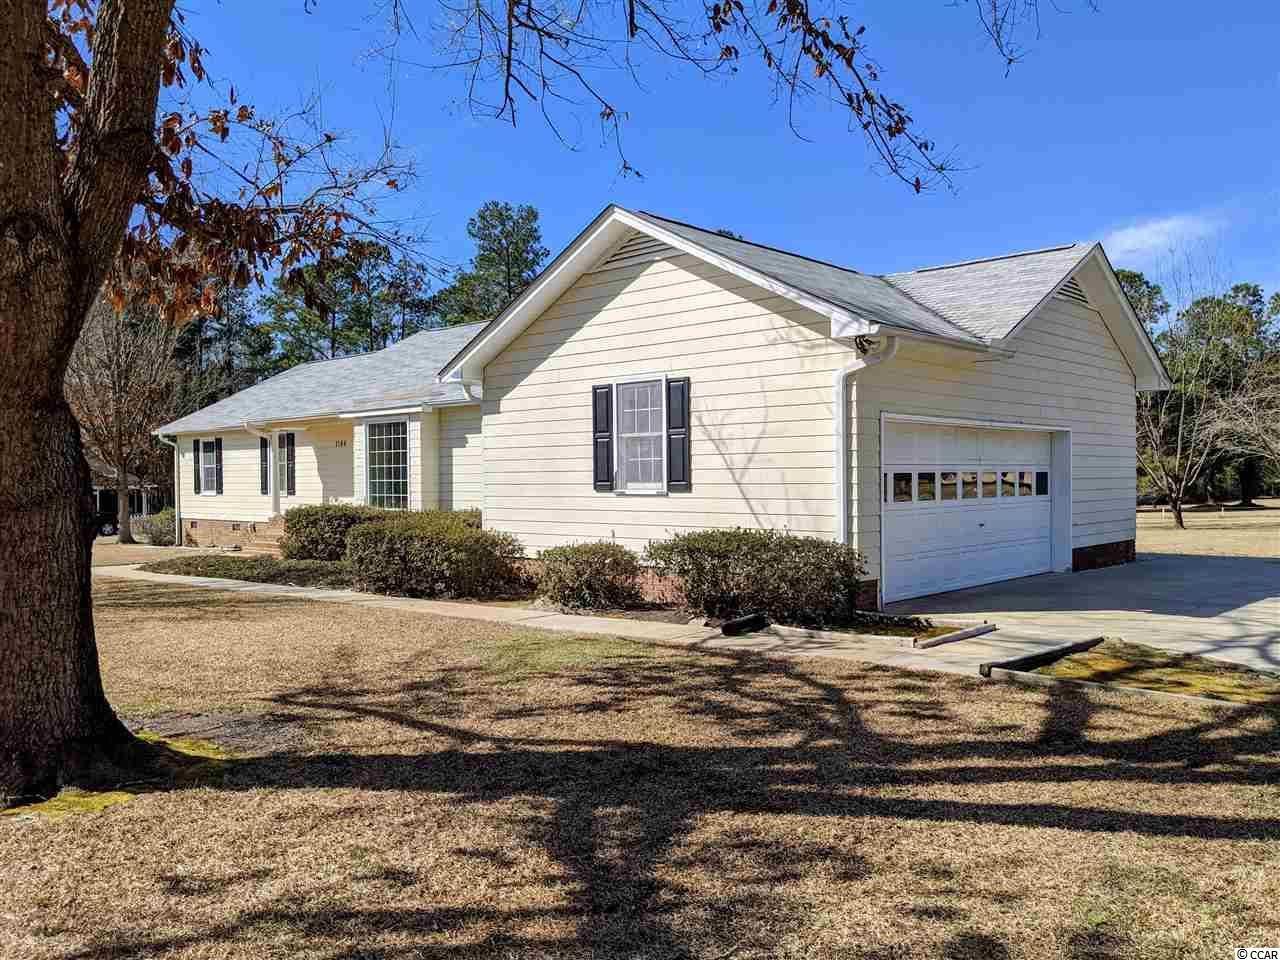 1186 Pointer Dr., Manning, SC, 29102, Quail Ridge  Manning Home For Sale